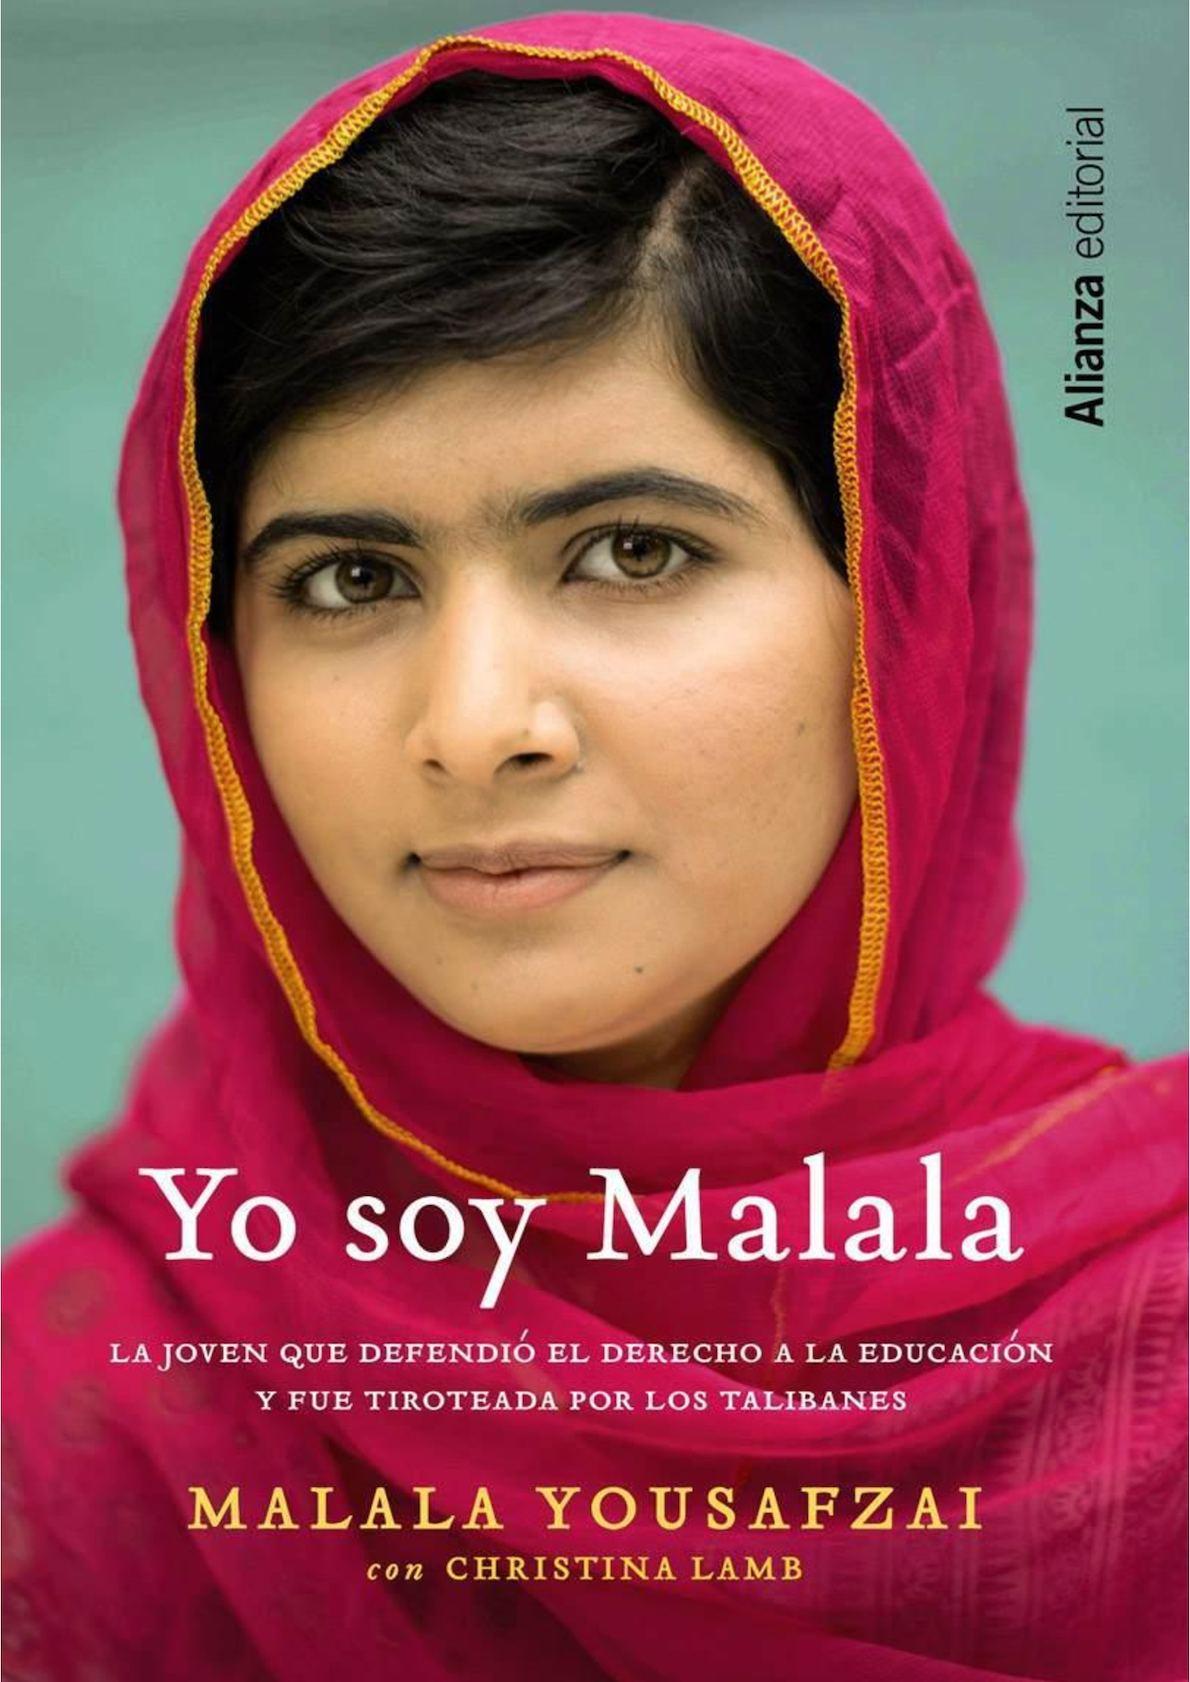 c92b04bf1 Calaméo - Yo Soy Malala Malala Yousafzai[1]